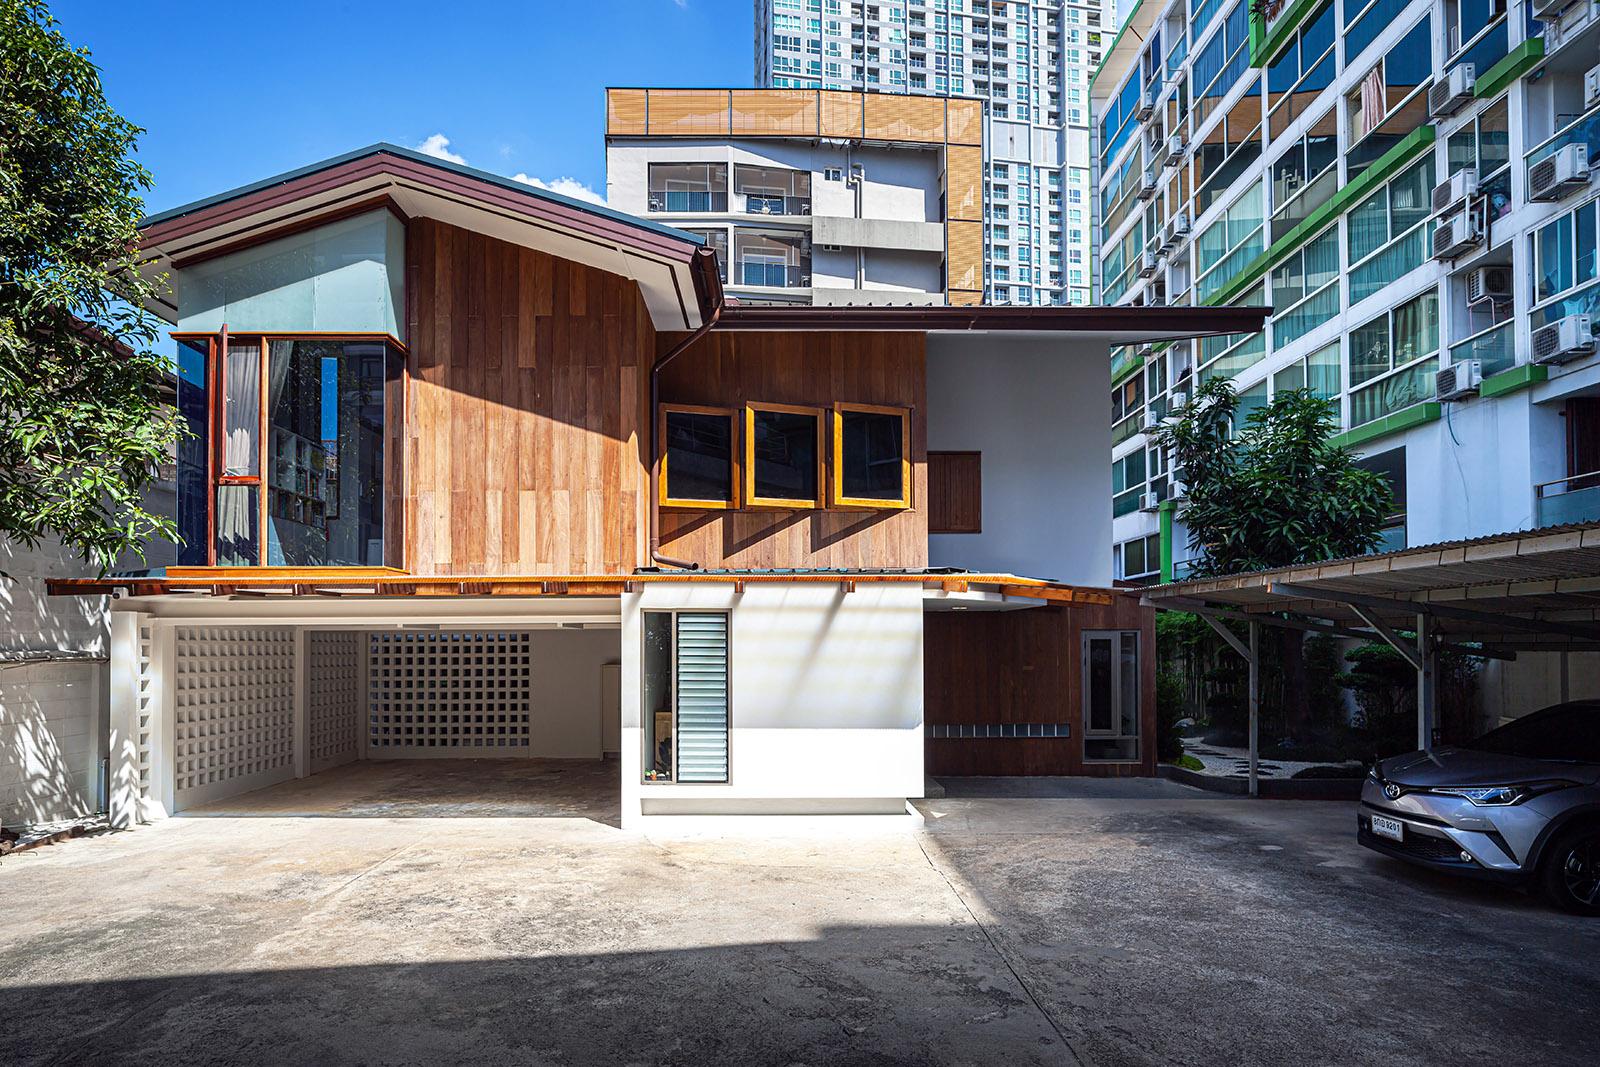 BAAN 38 in Bangkok, Thailand by Junsekino Architect and Design